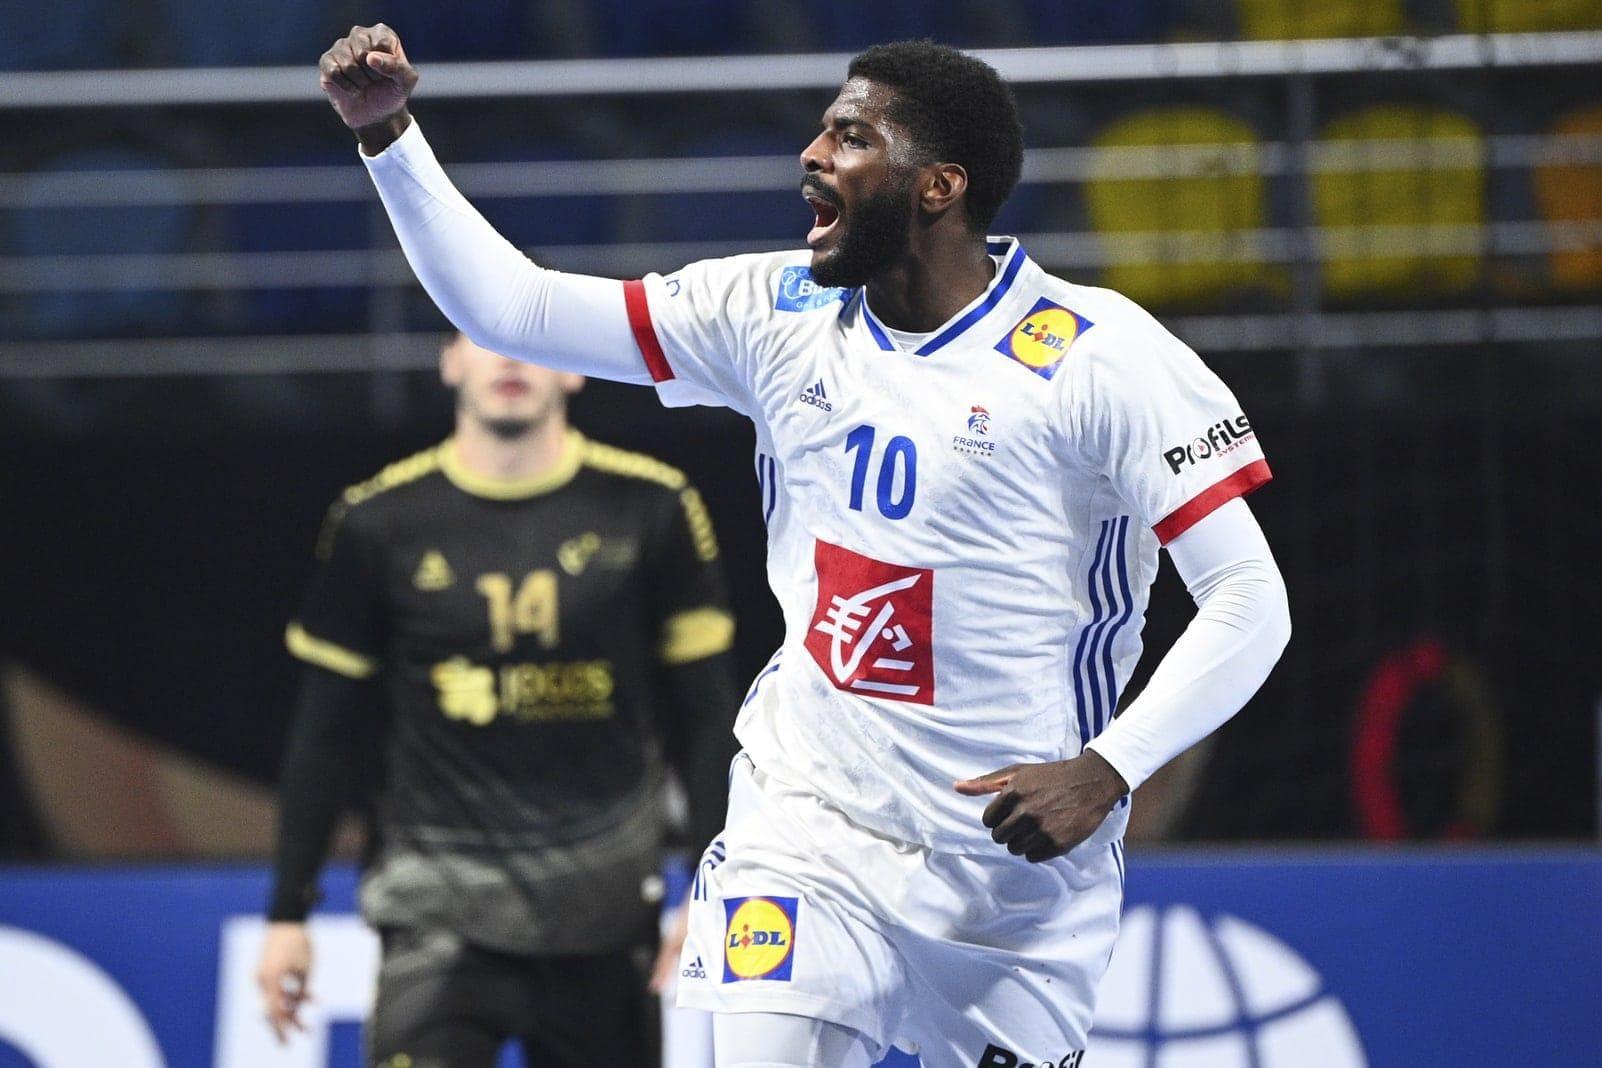 Finale Handball Wm 2021